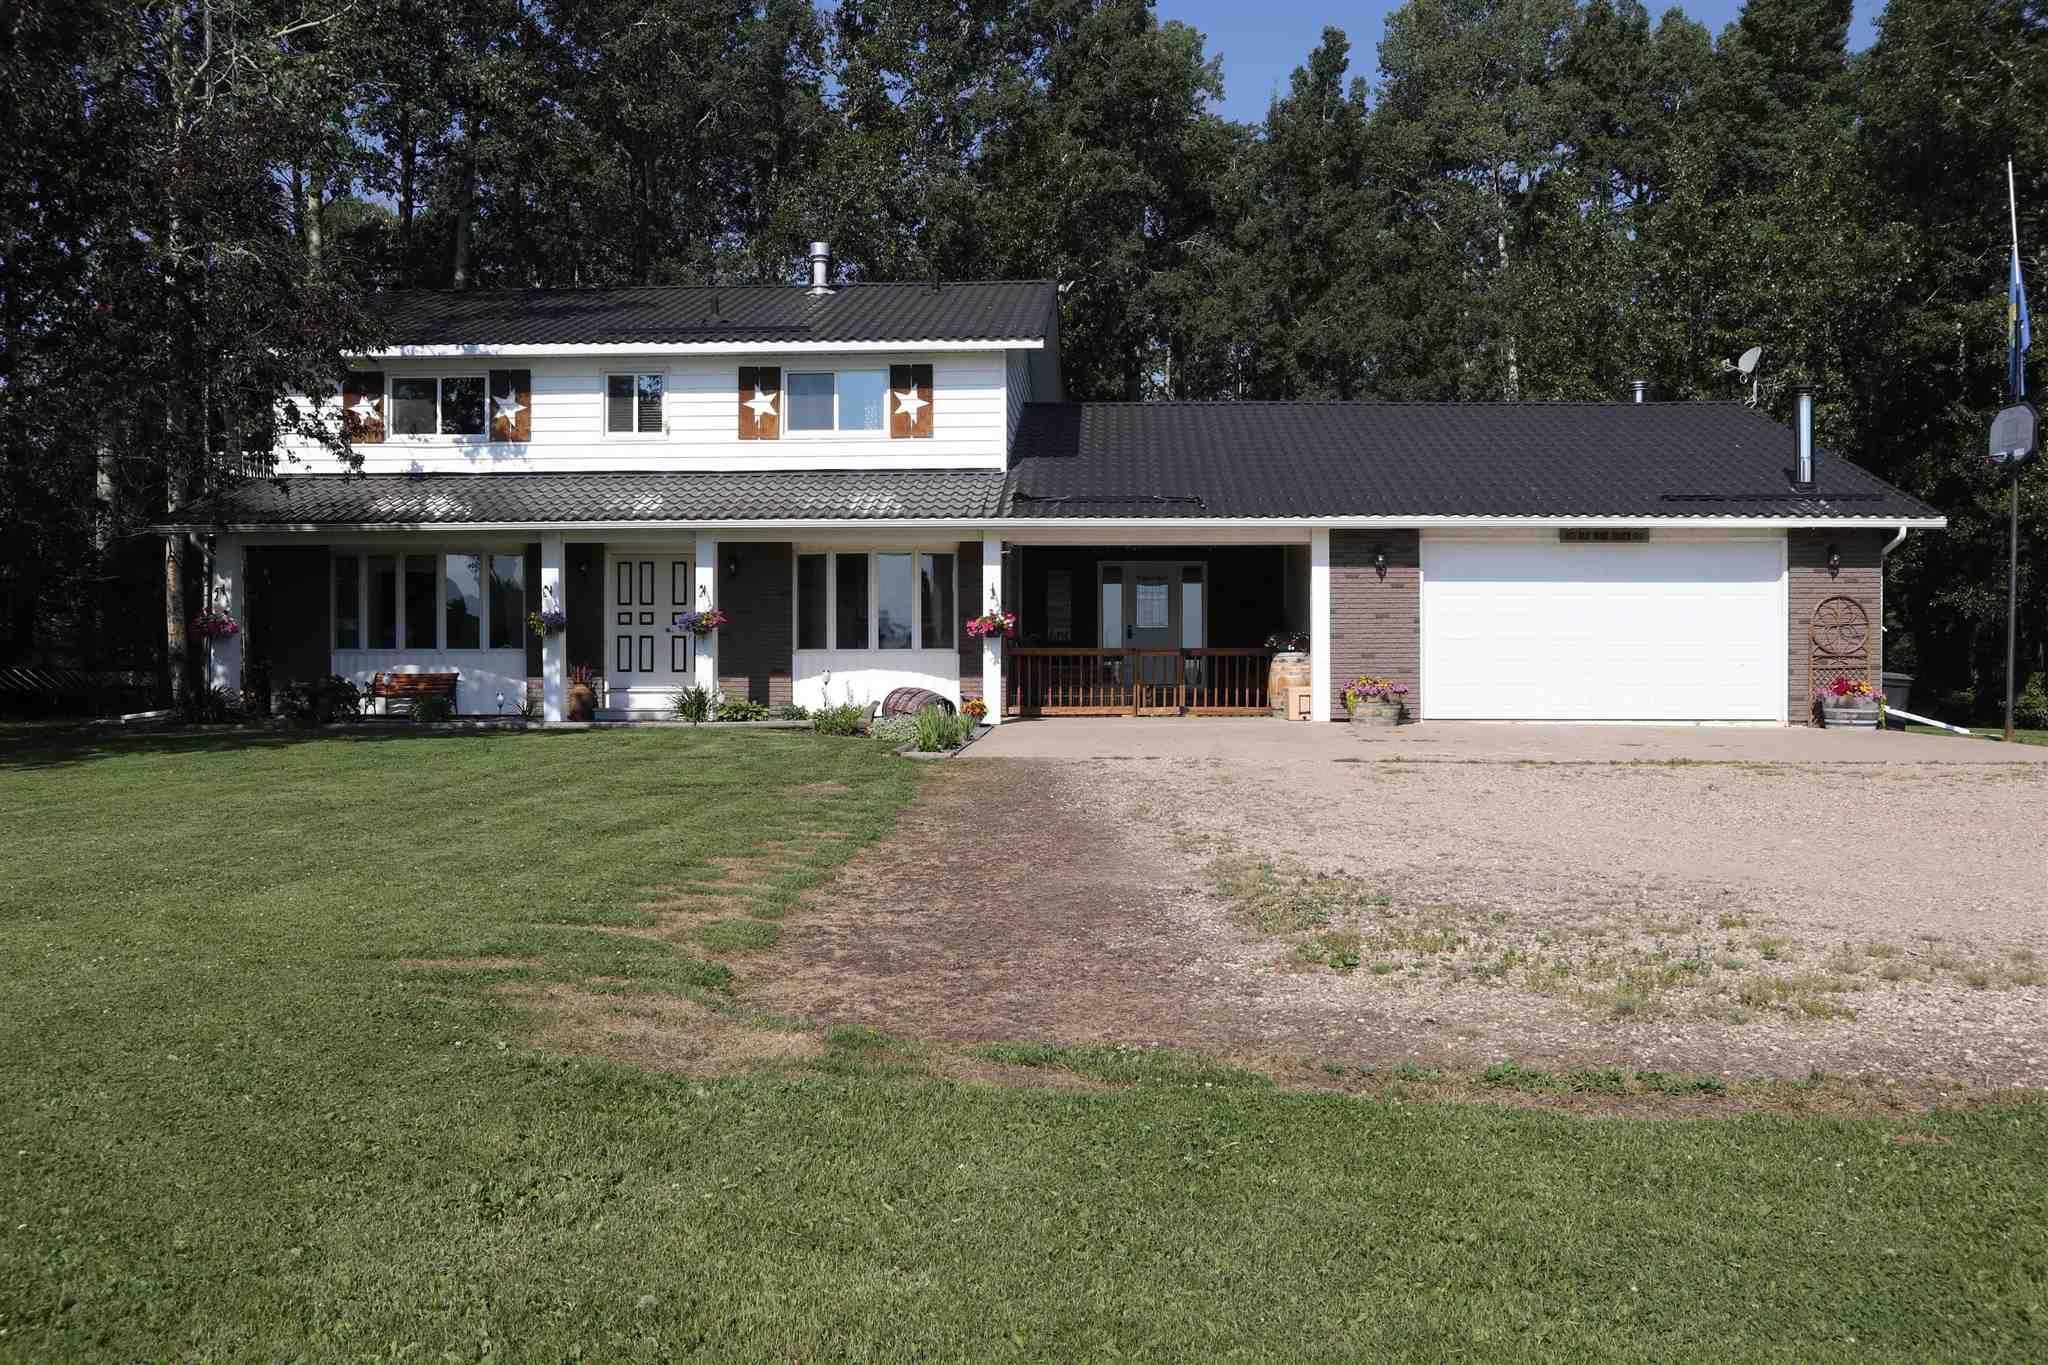 Main Photo: 461028 RR 74: Rural Wetaskiwin County House for sale : MLS®# E4252935